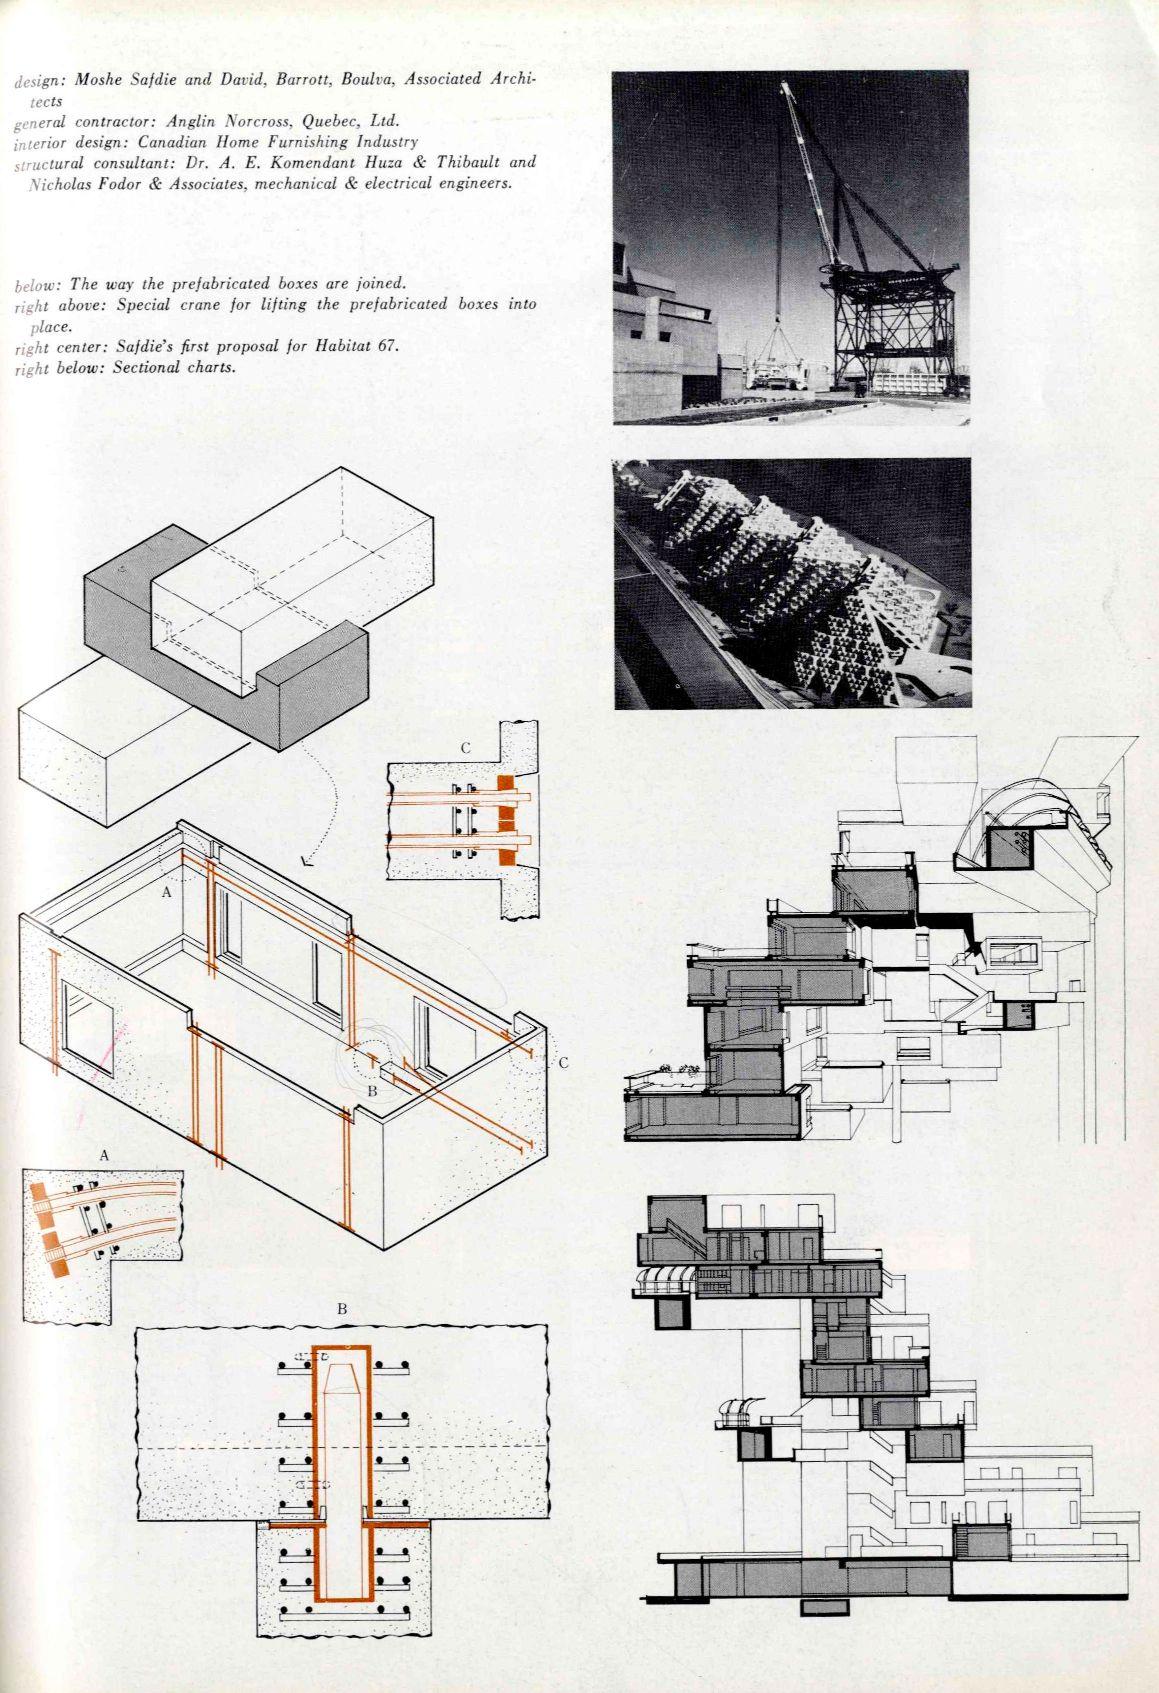 Moshe safdie habitat 67 montreal canada 1967 my for Landscape architecture canada